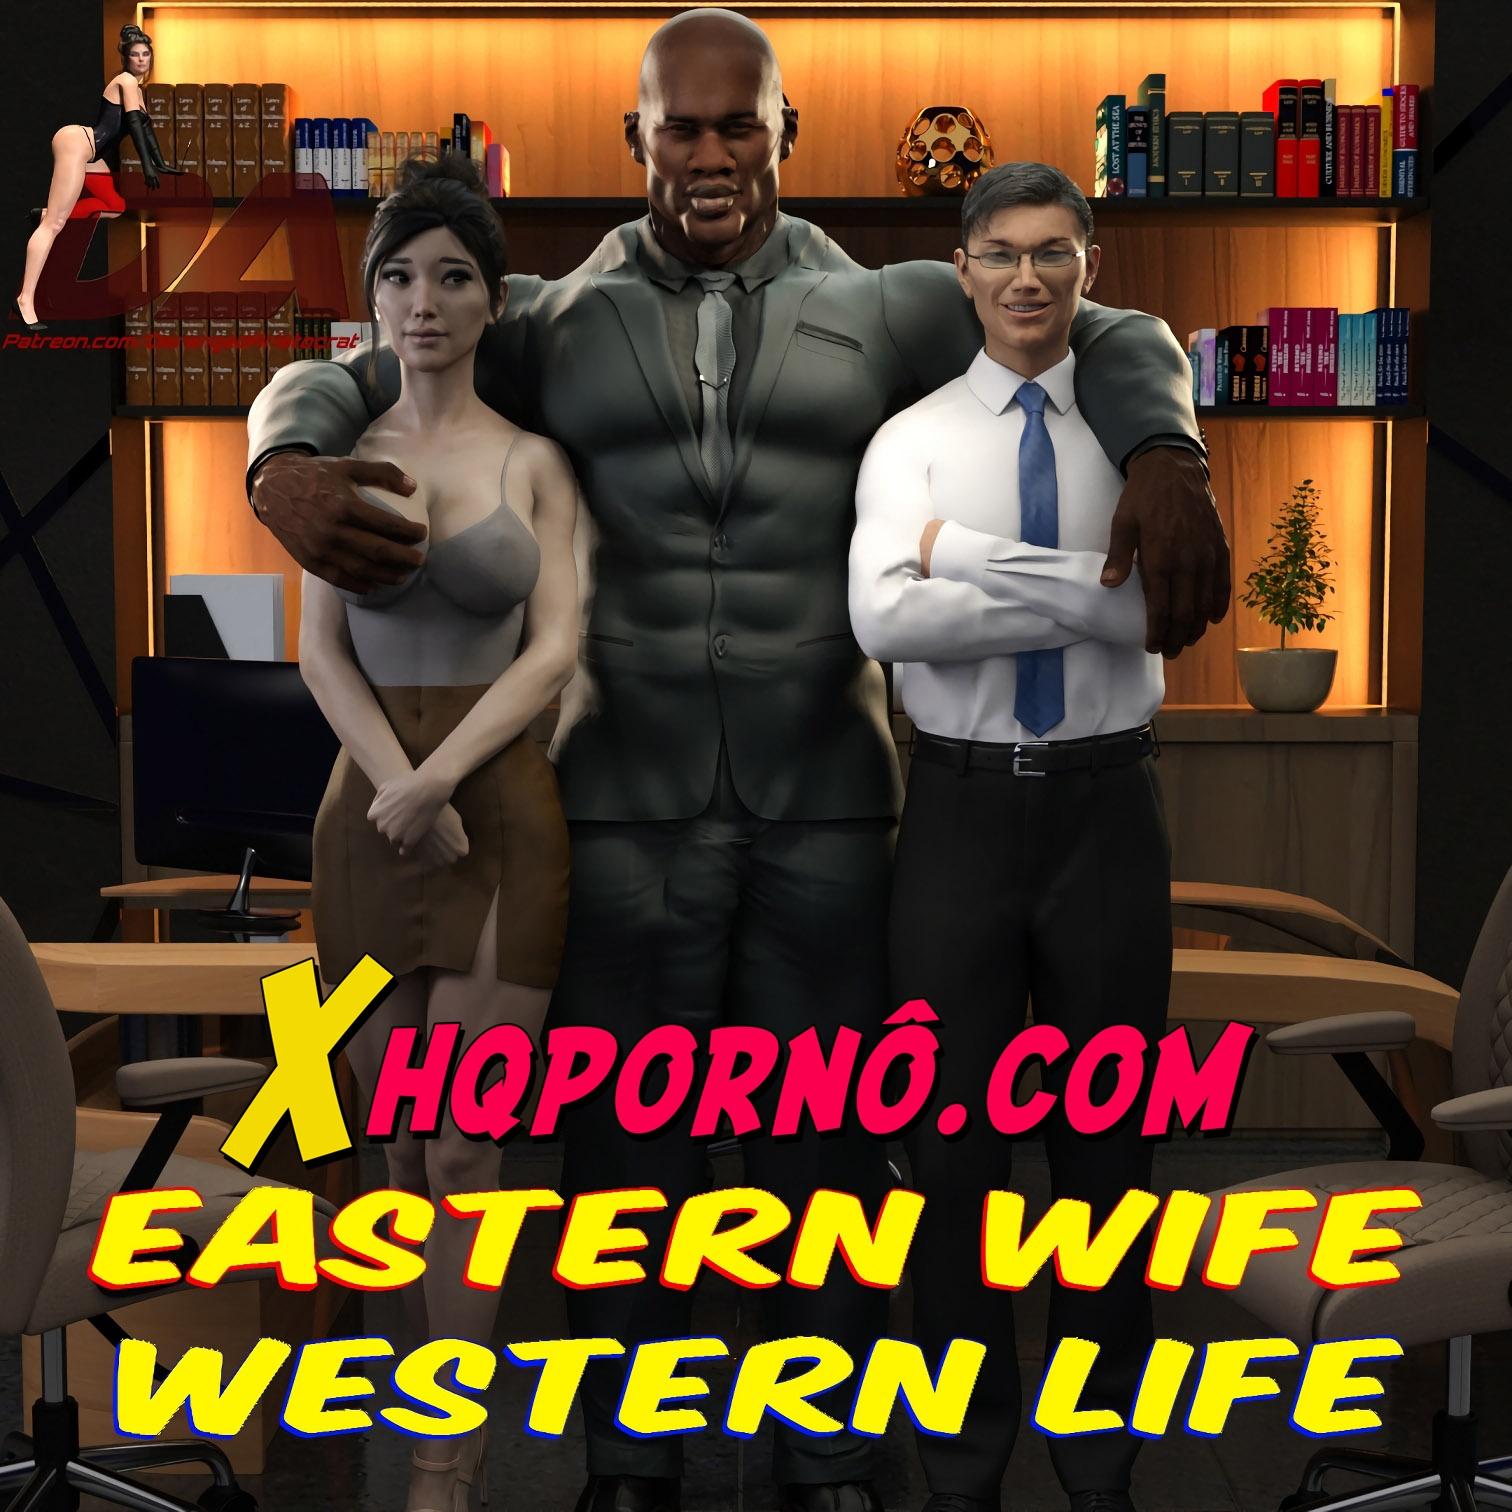 Esposa Oriental vida Ocidental 1u